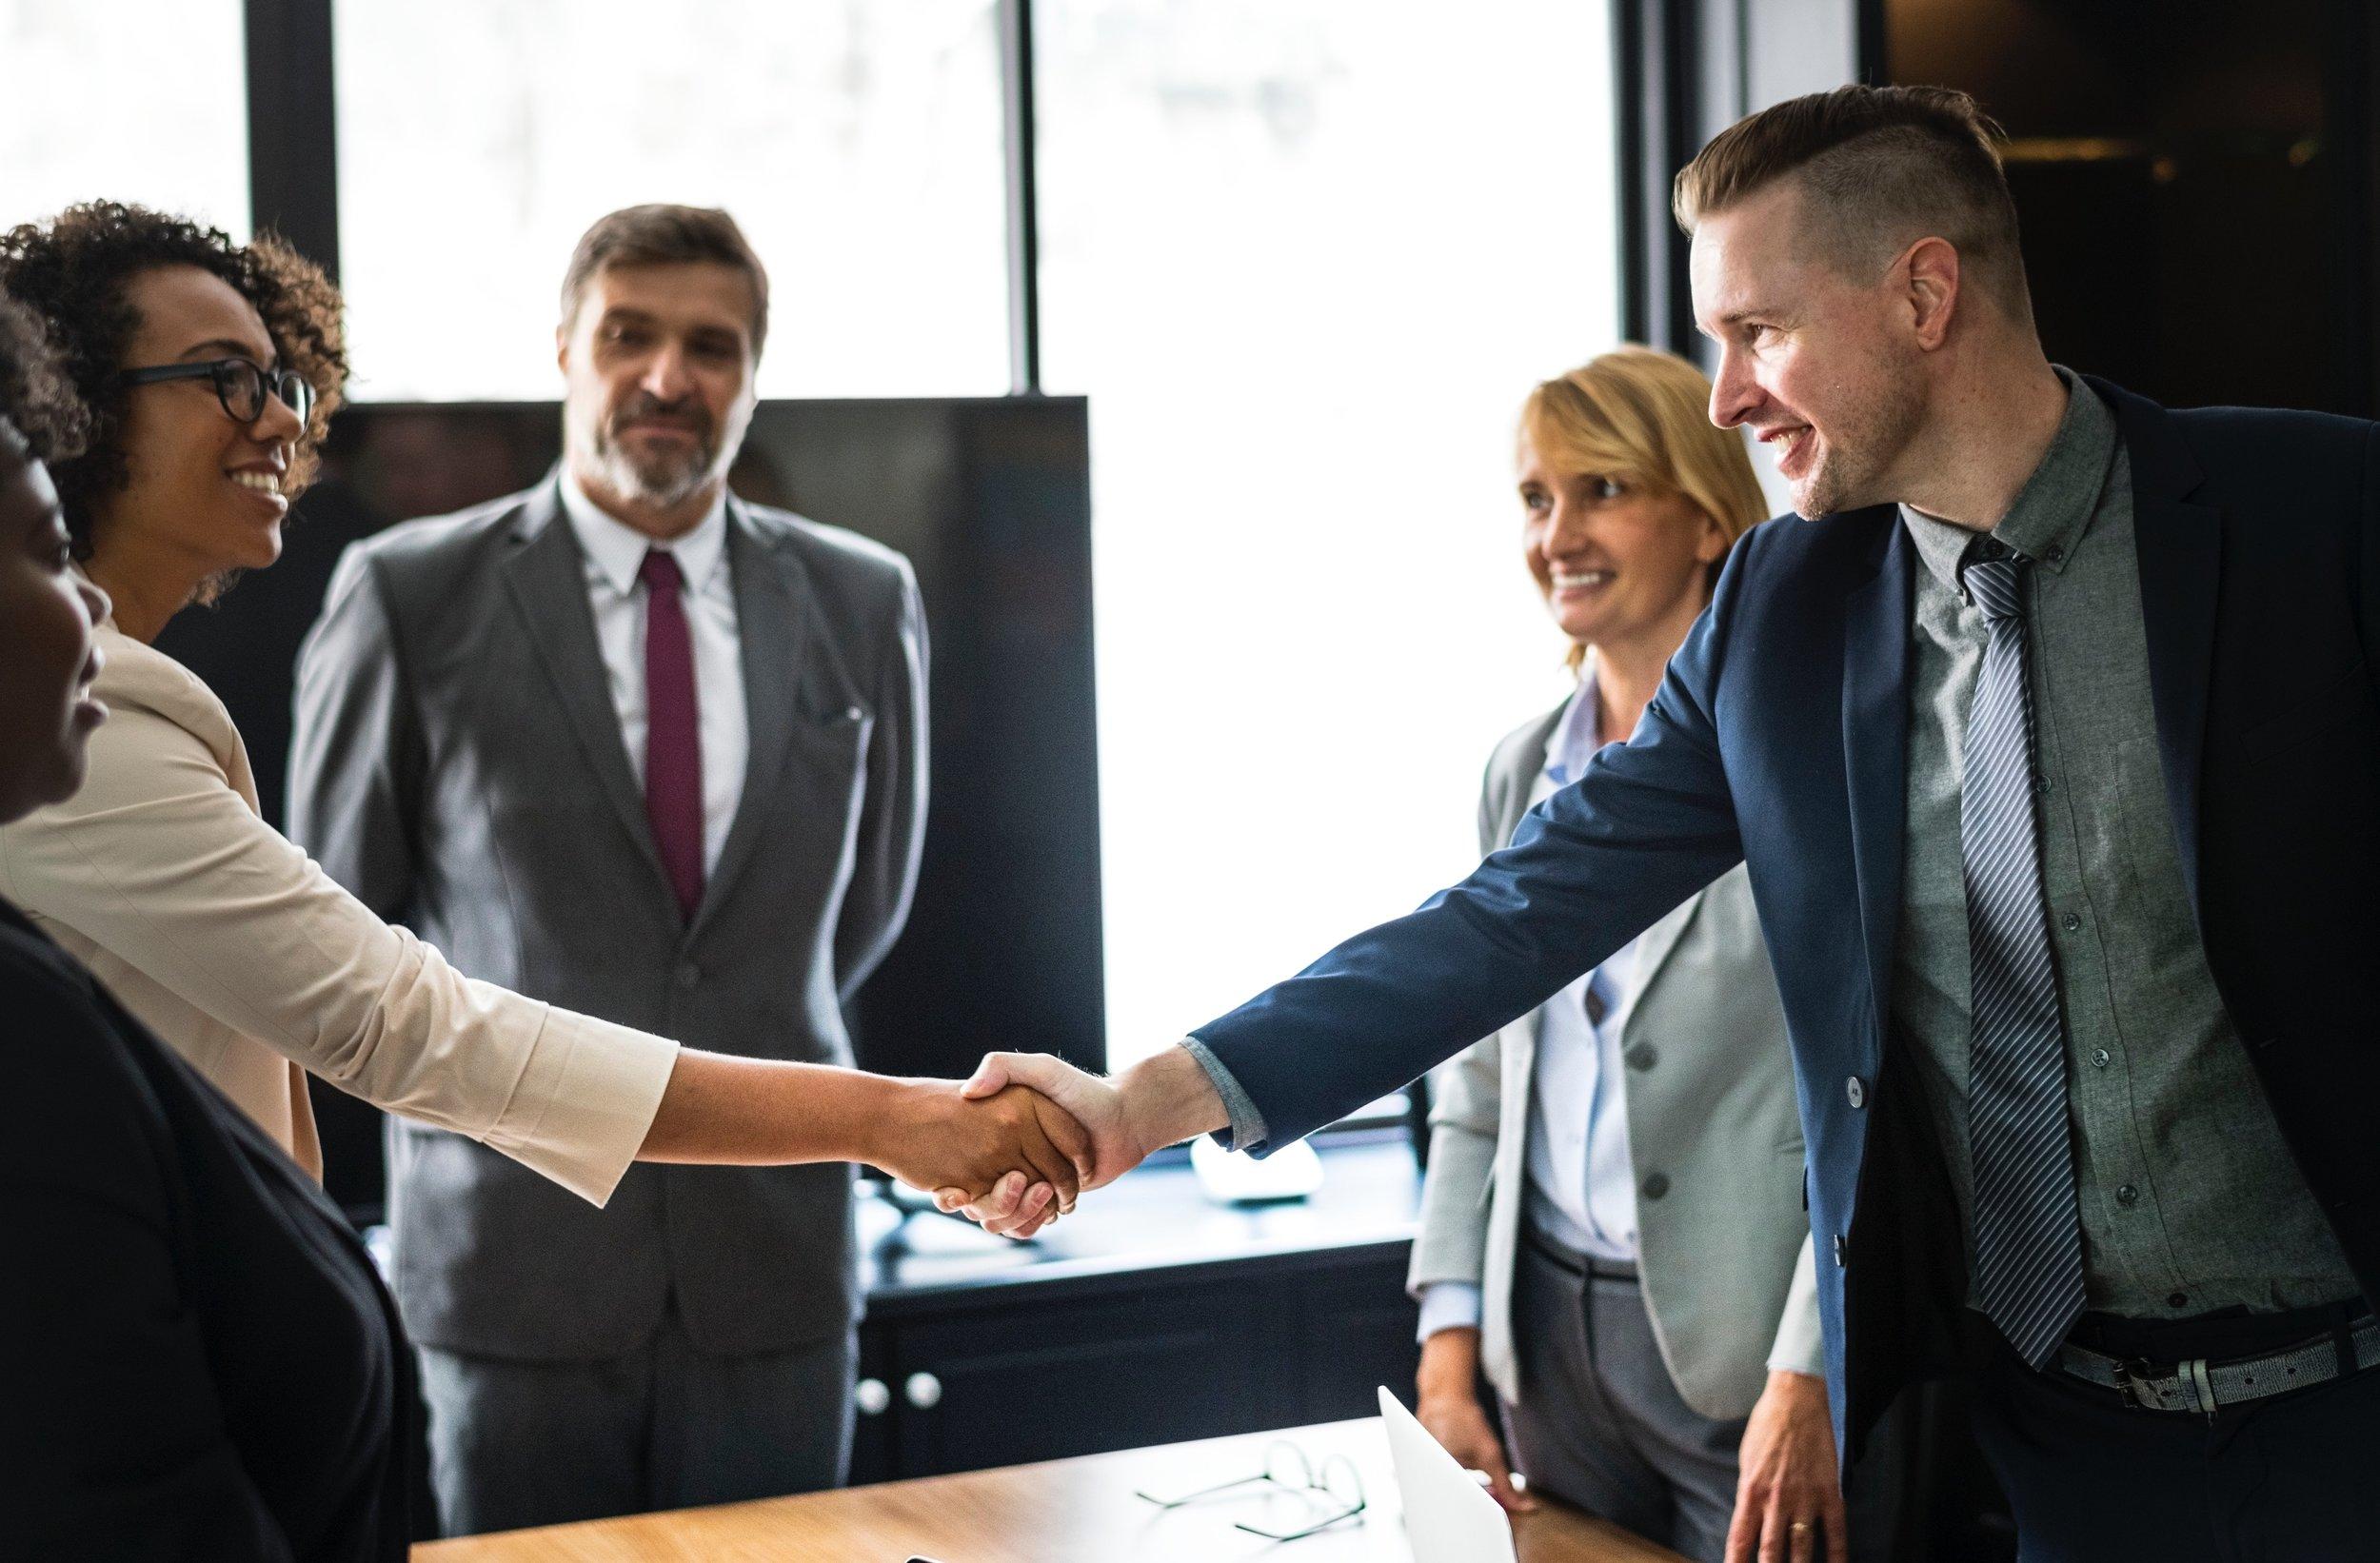 accomplishment-agreement-business-1249158.jpg